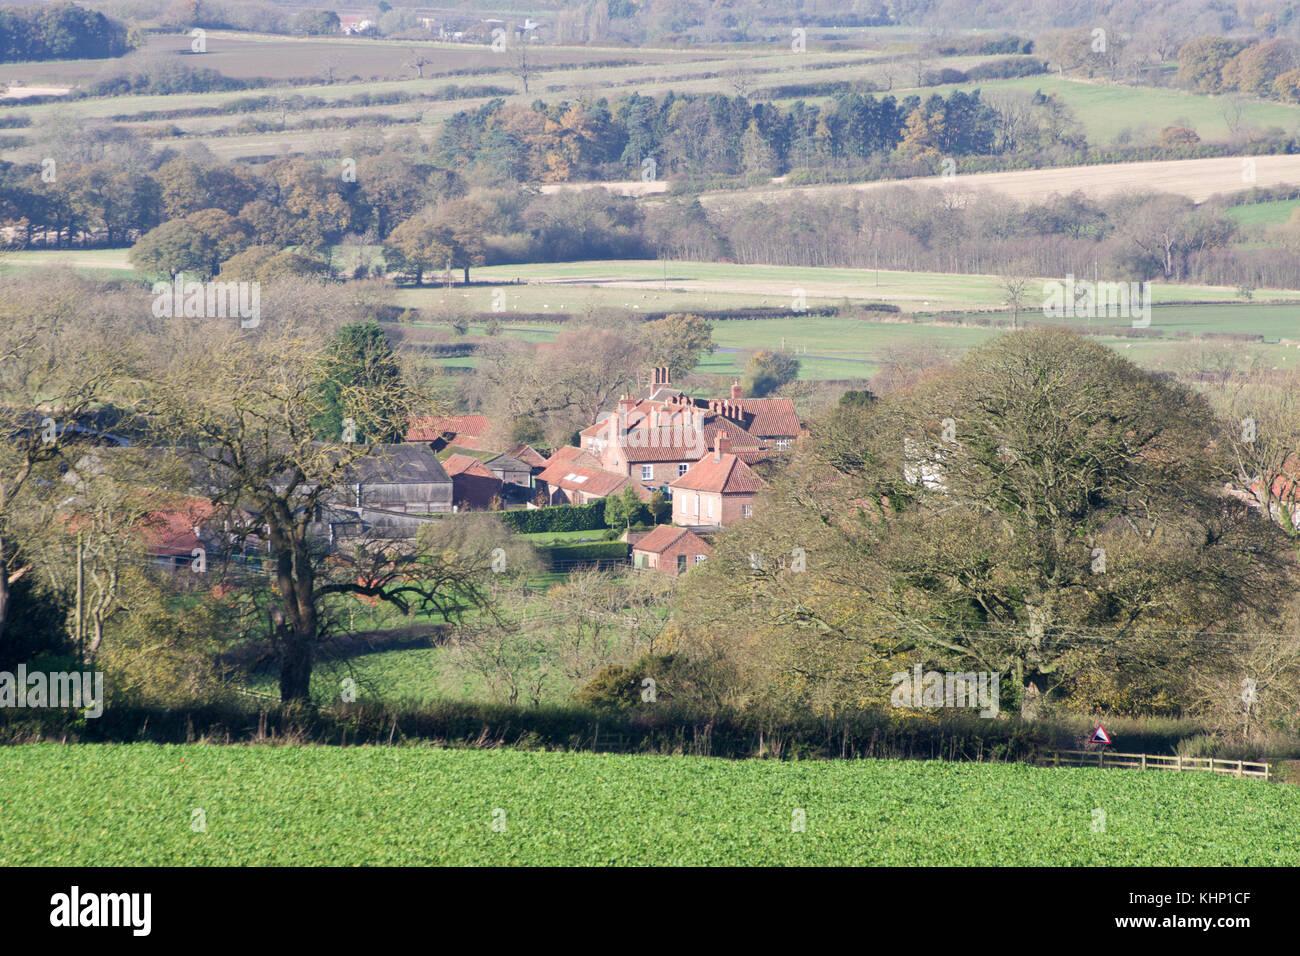 Kirby Underdale Village - Stock Image